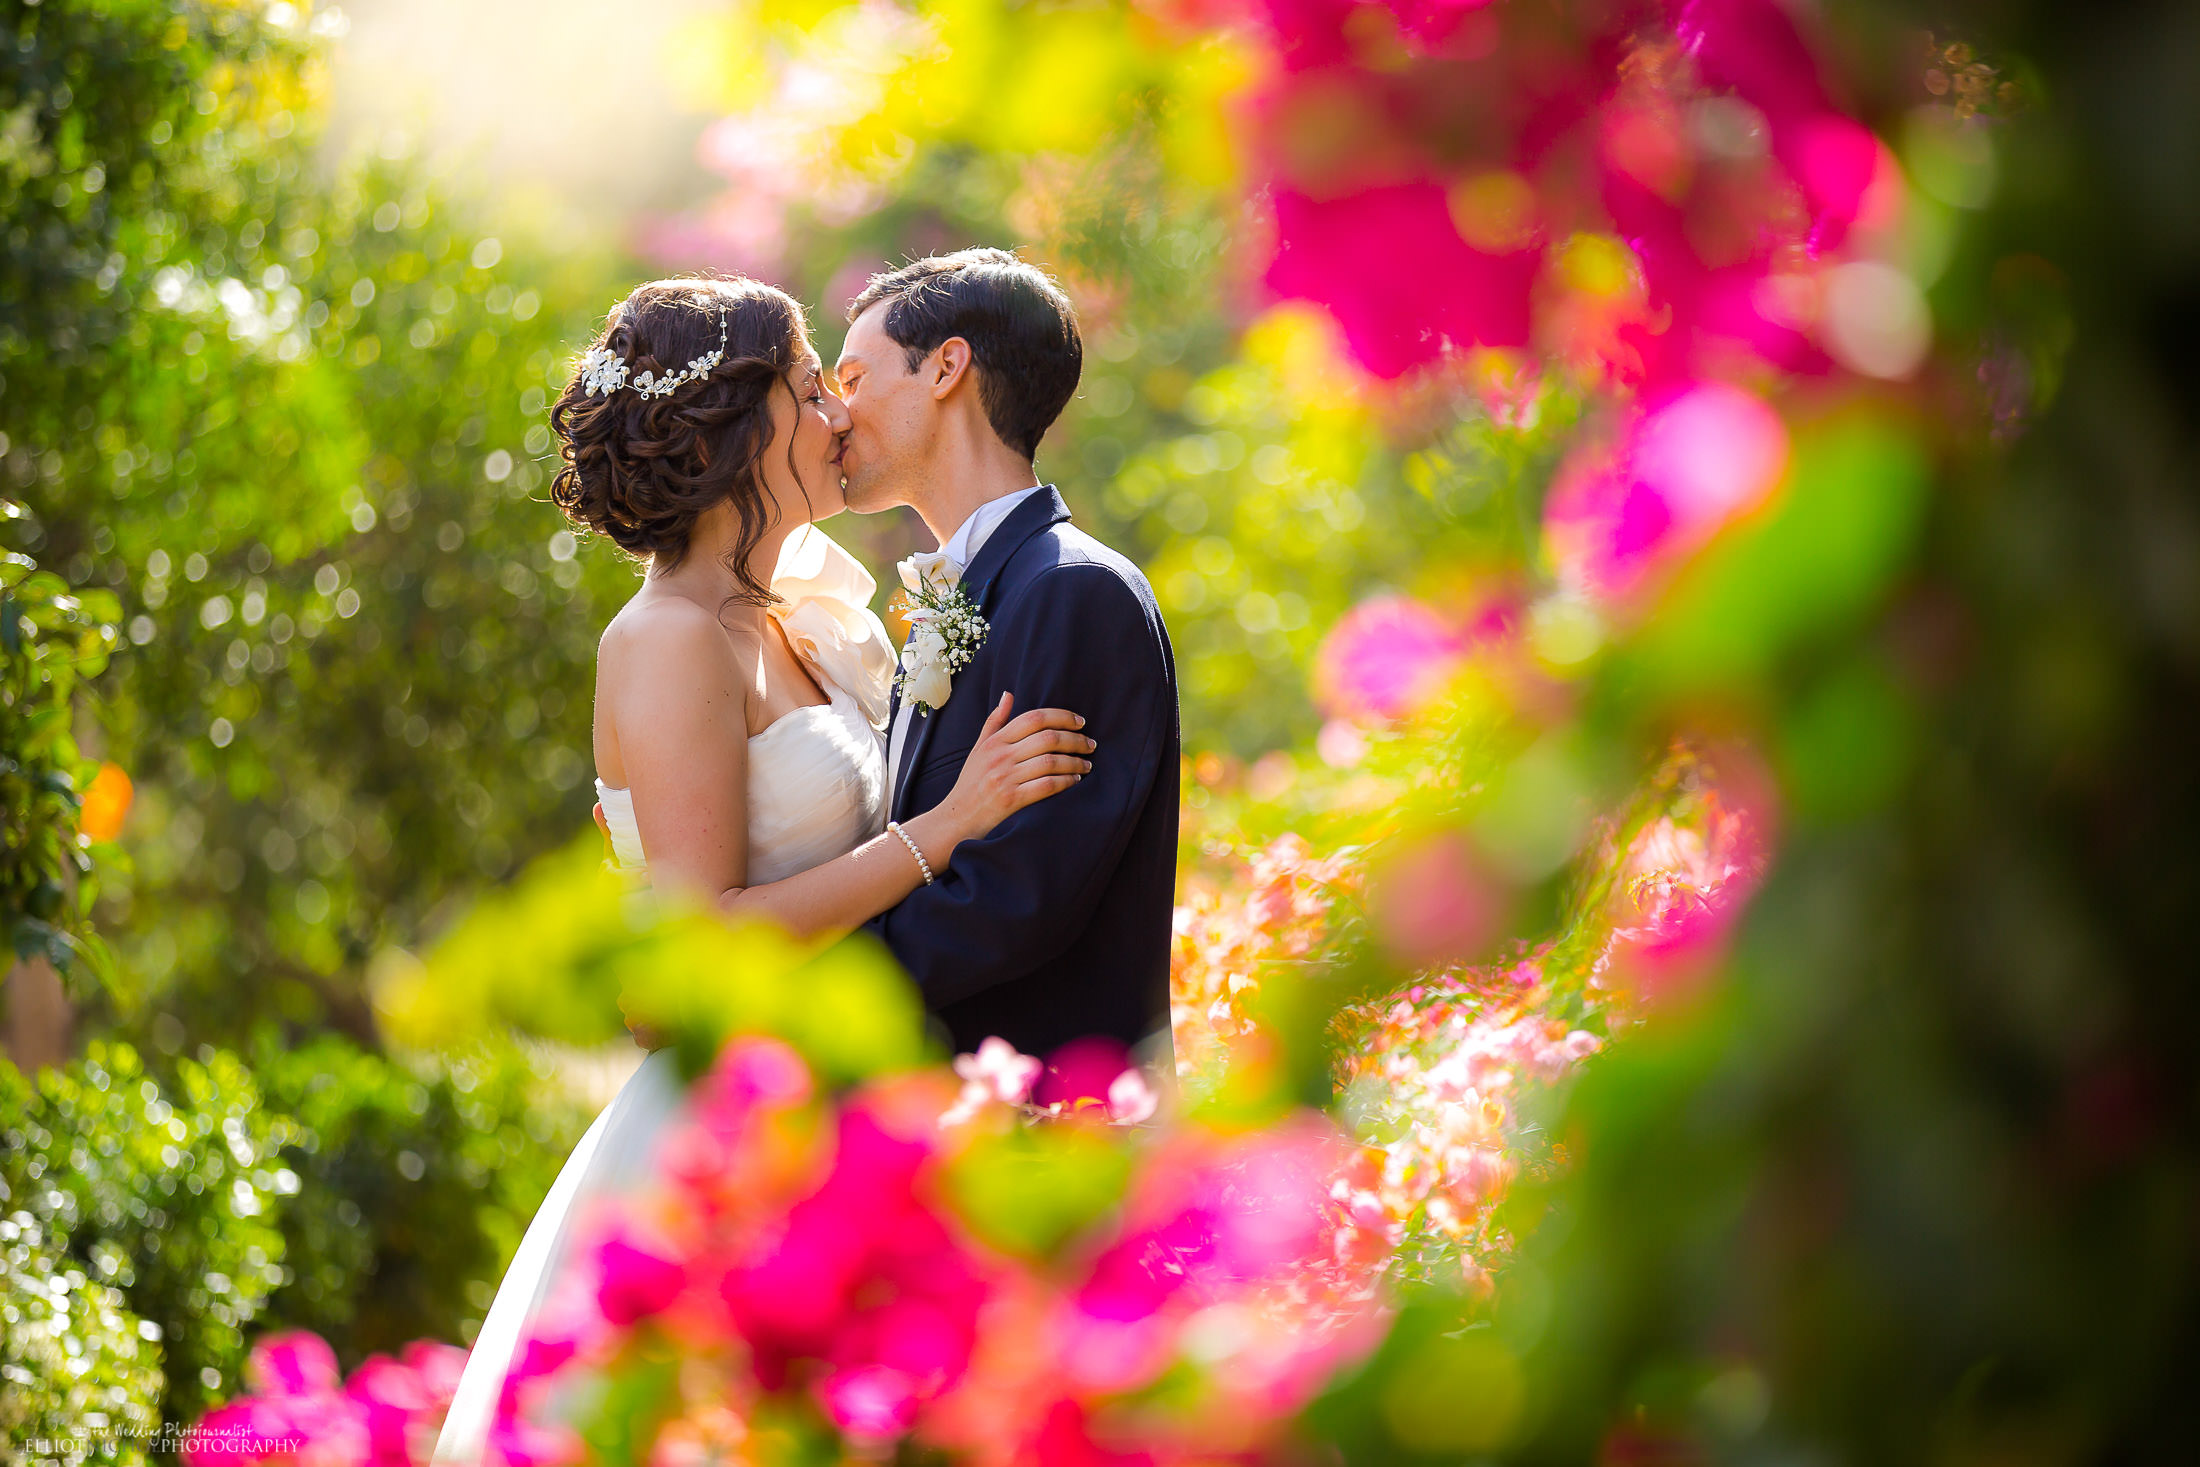 Bride & Groom kiss in the colourful gardens of their wedding reception venue. Photo by Northeast wedding photographer, Elliot Nichol.